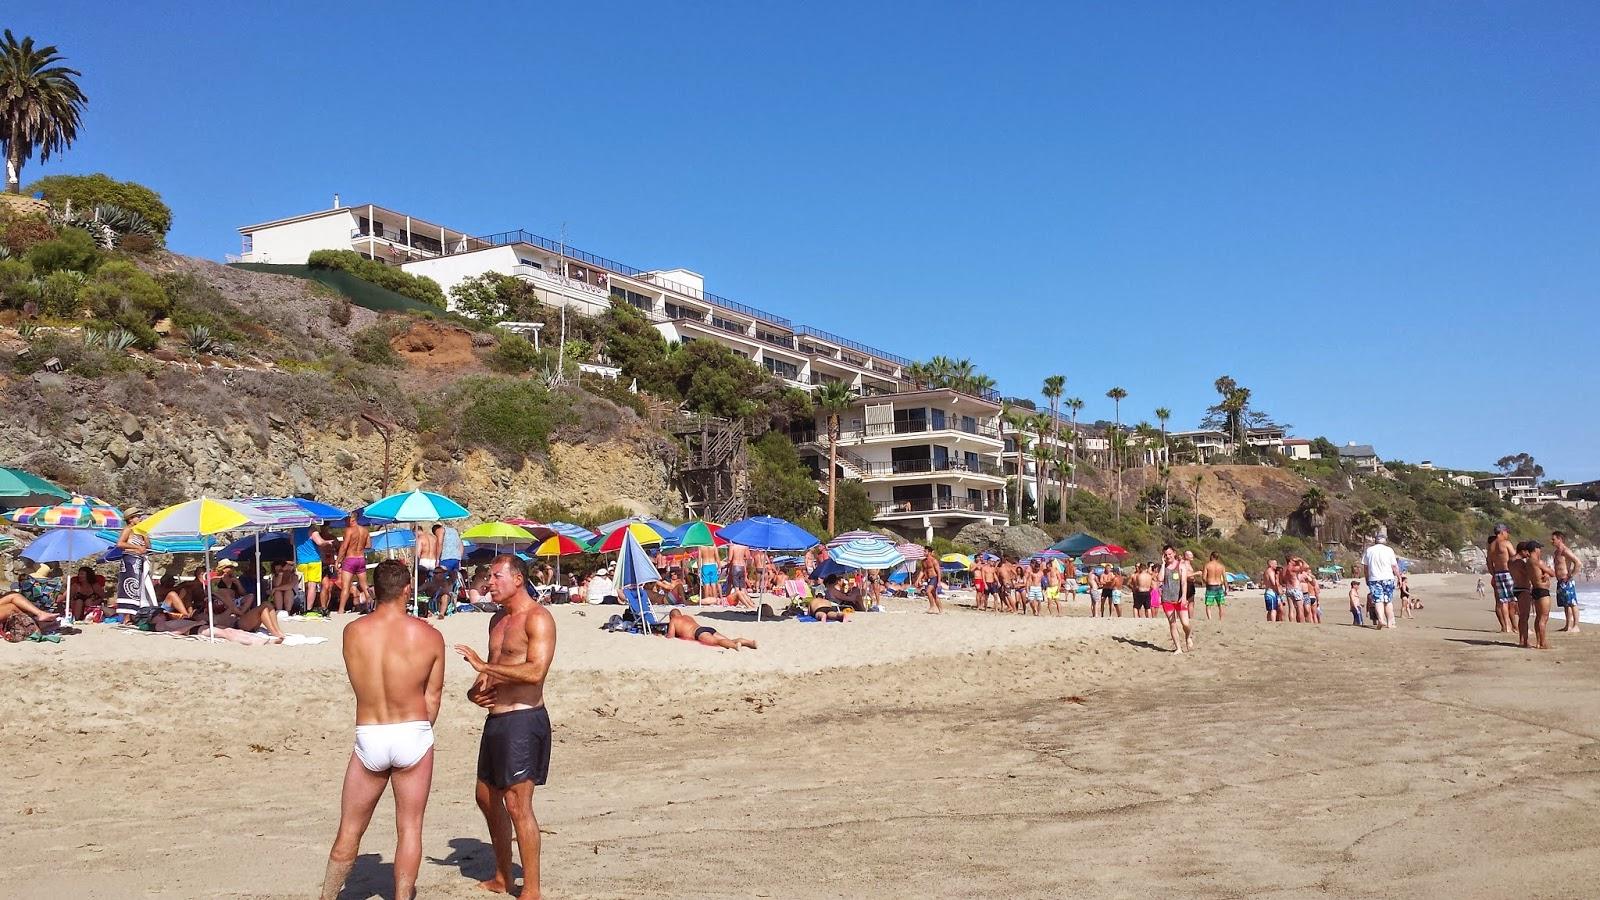 My very own Pensieve.: West street gay beach at Laguna Beach